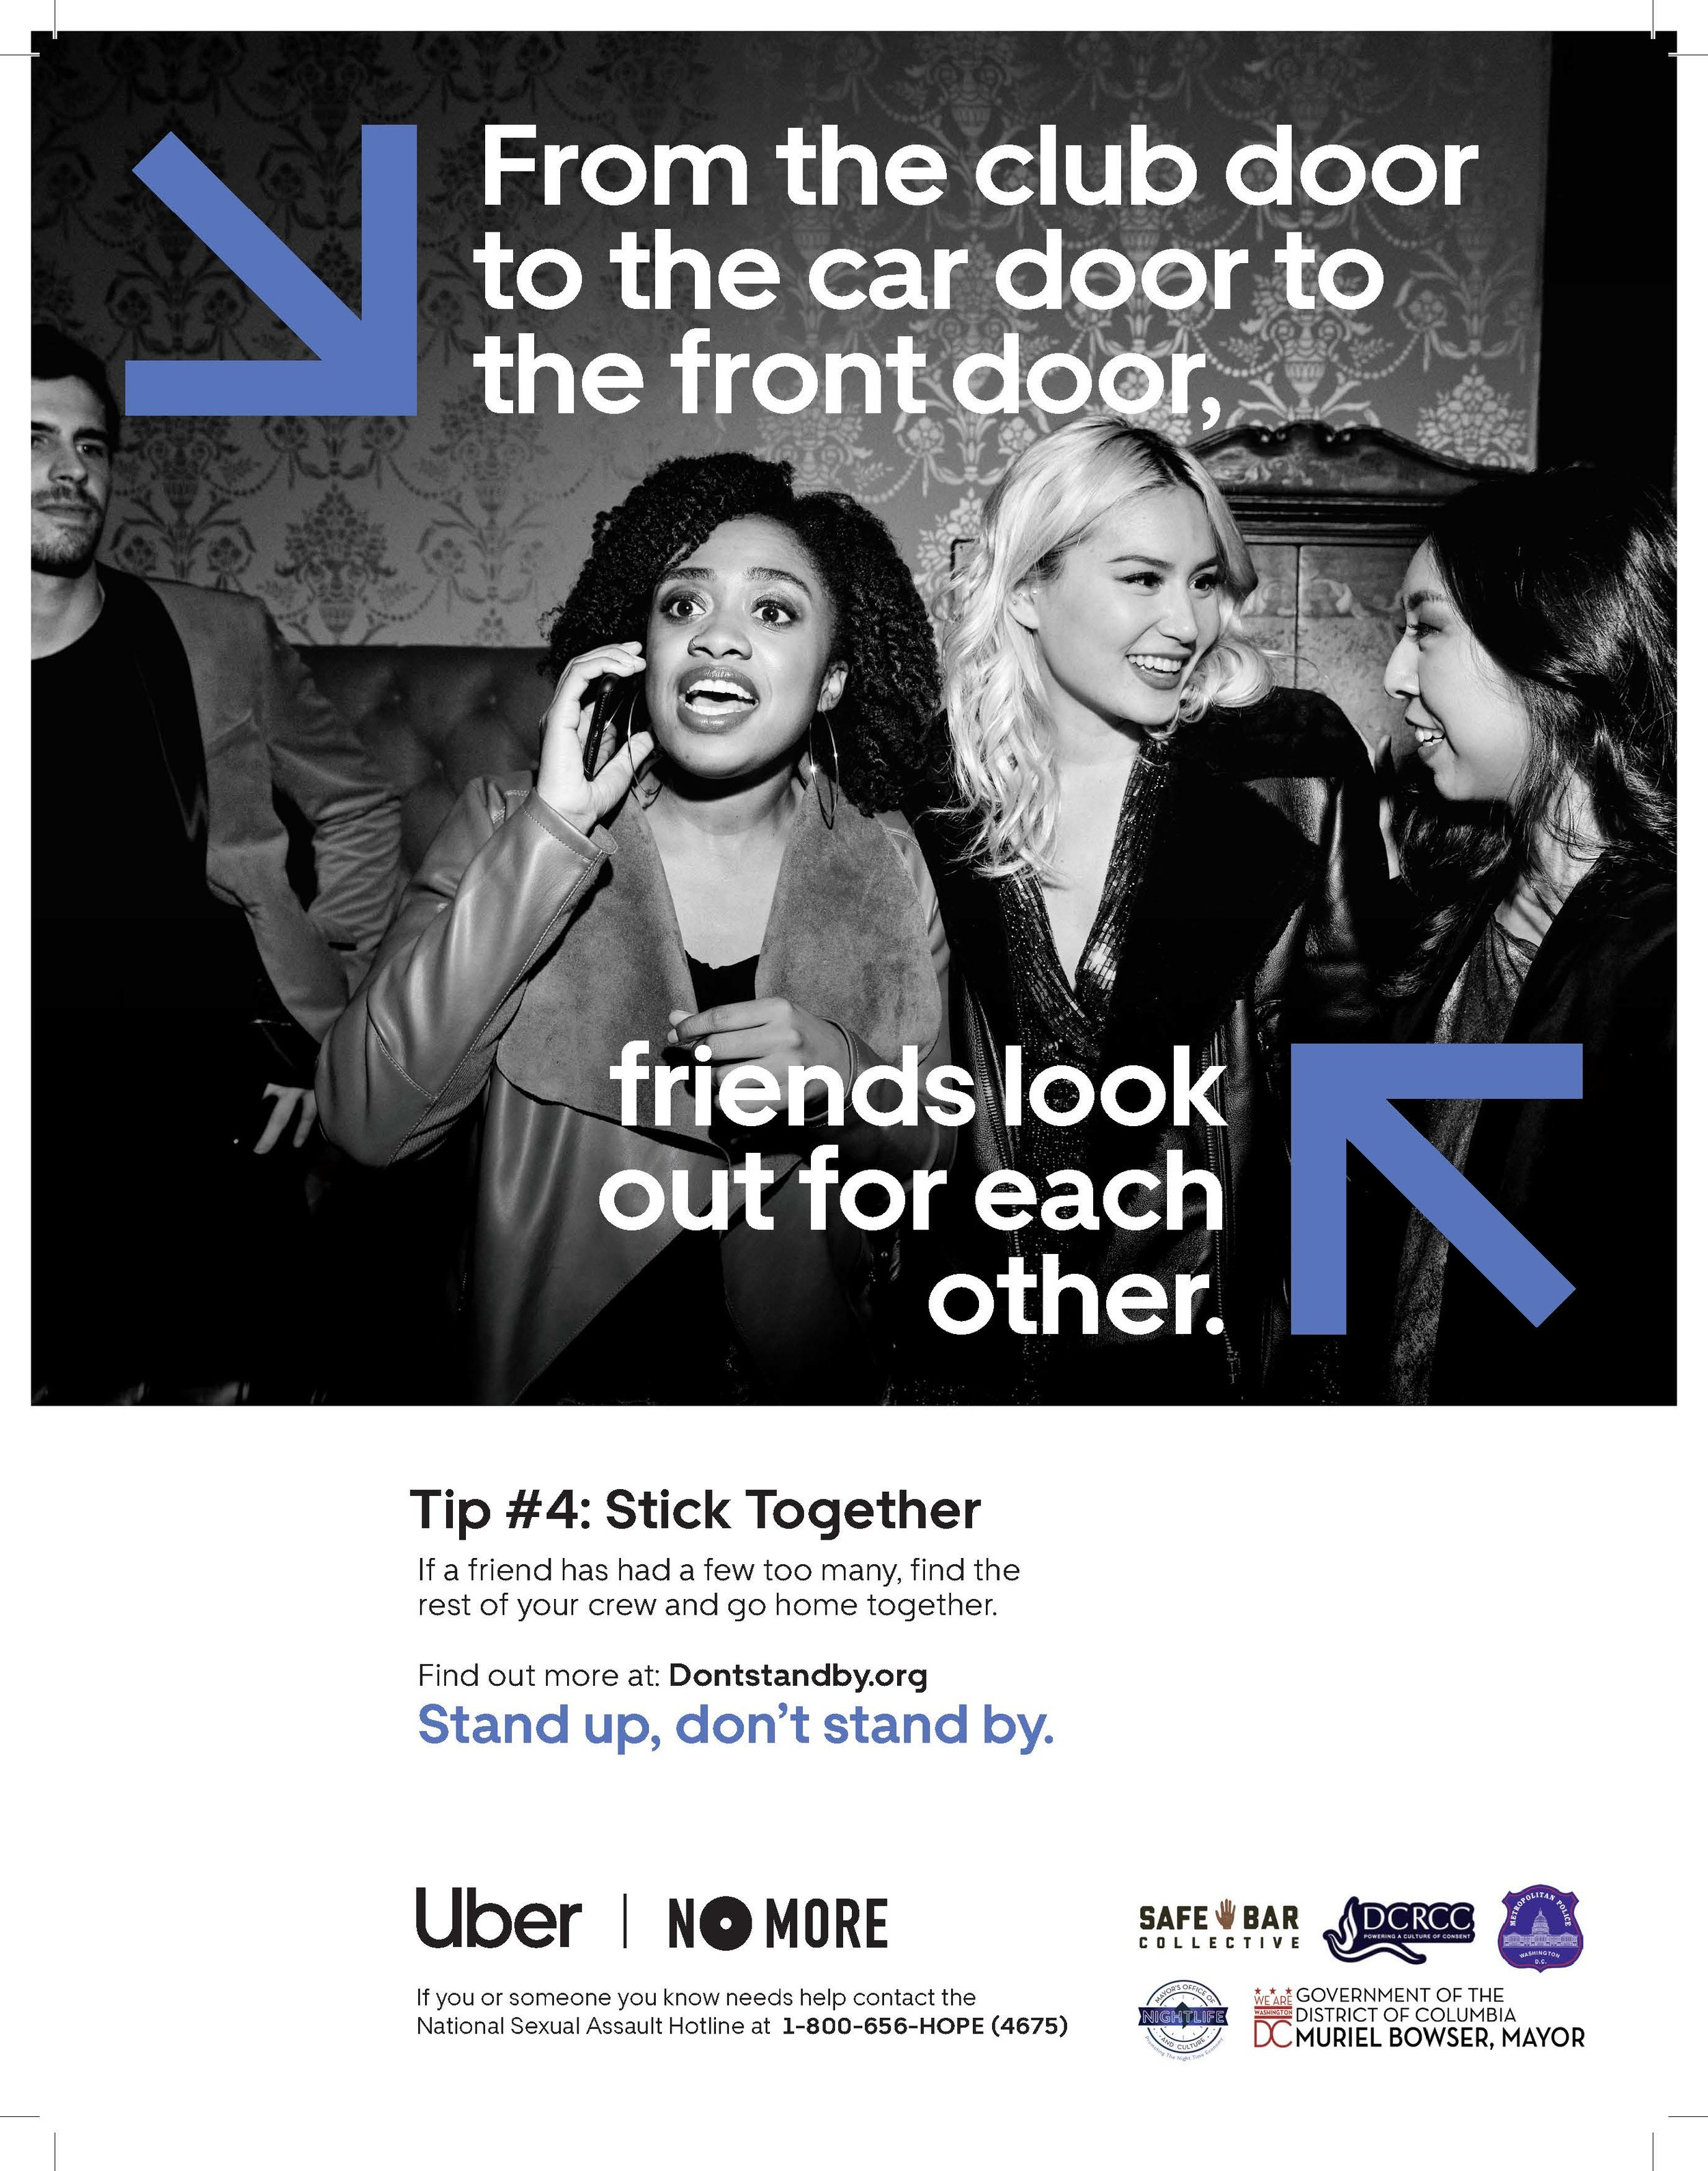 Uber-Safety_DC_Letter_8_PRINT (1)_Page_4.jpg